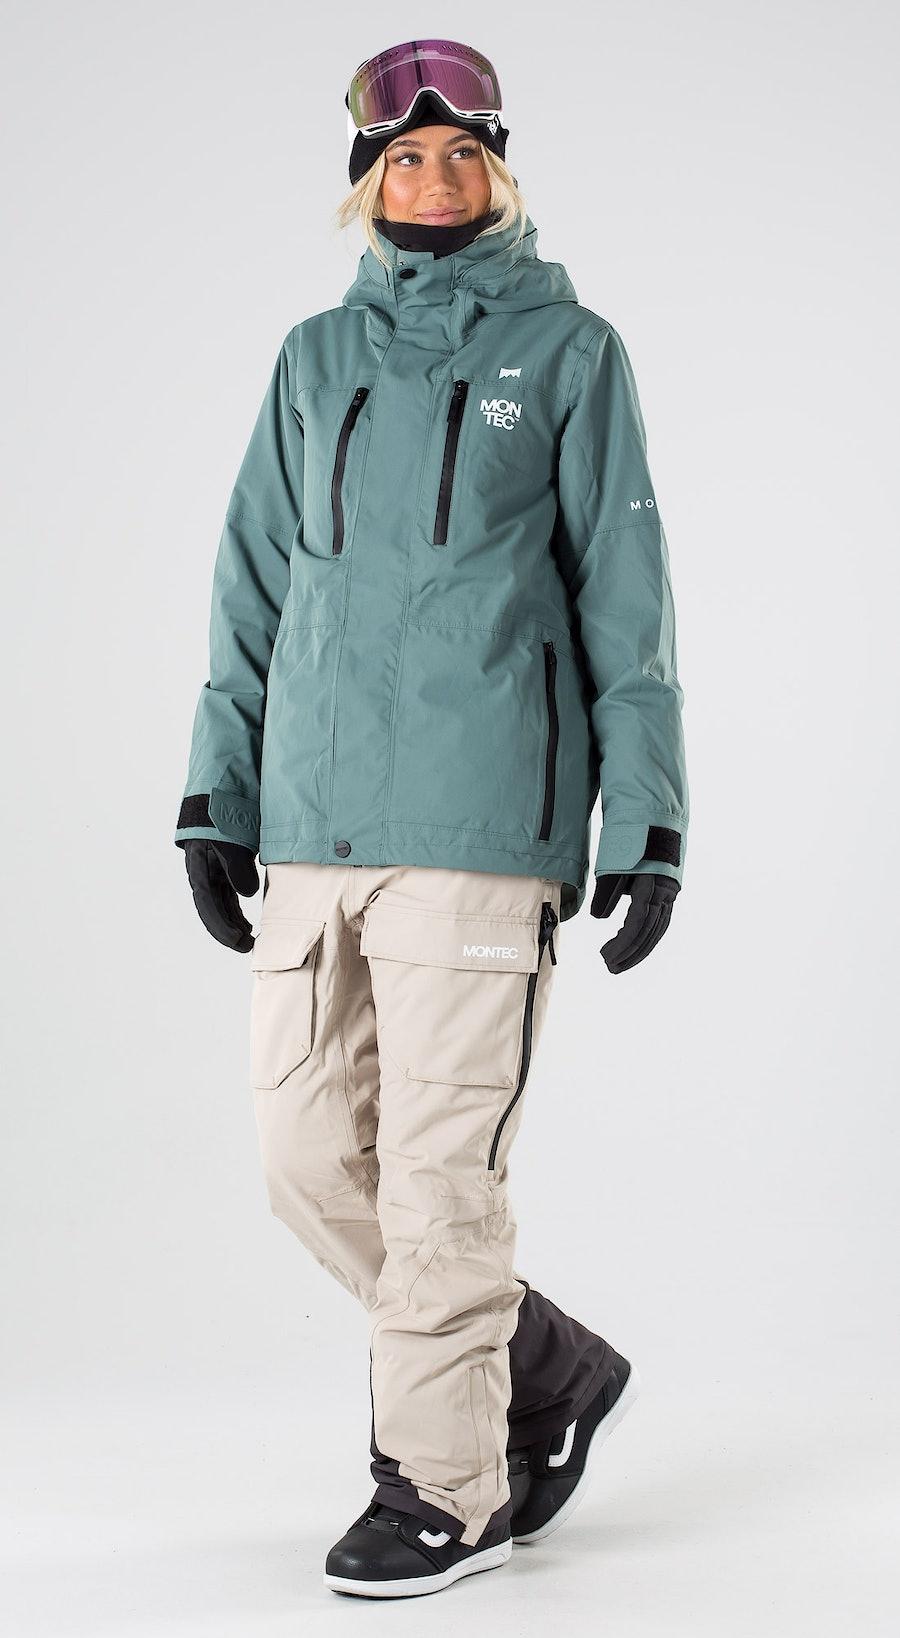 Montec Fawk W Atlantic Snowboard clothing Multi